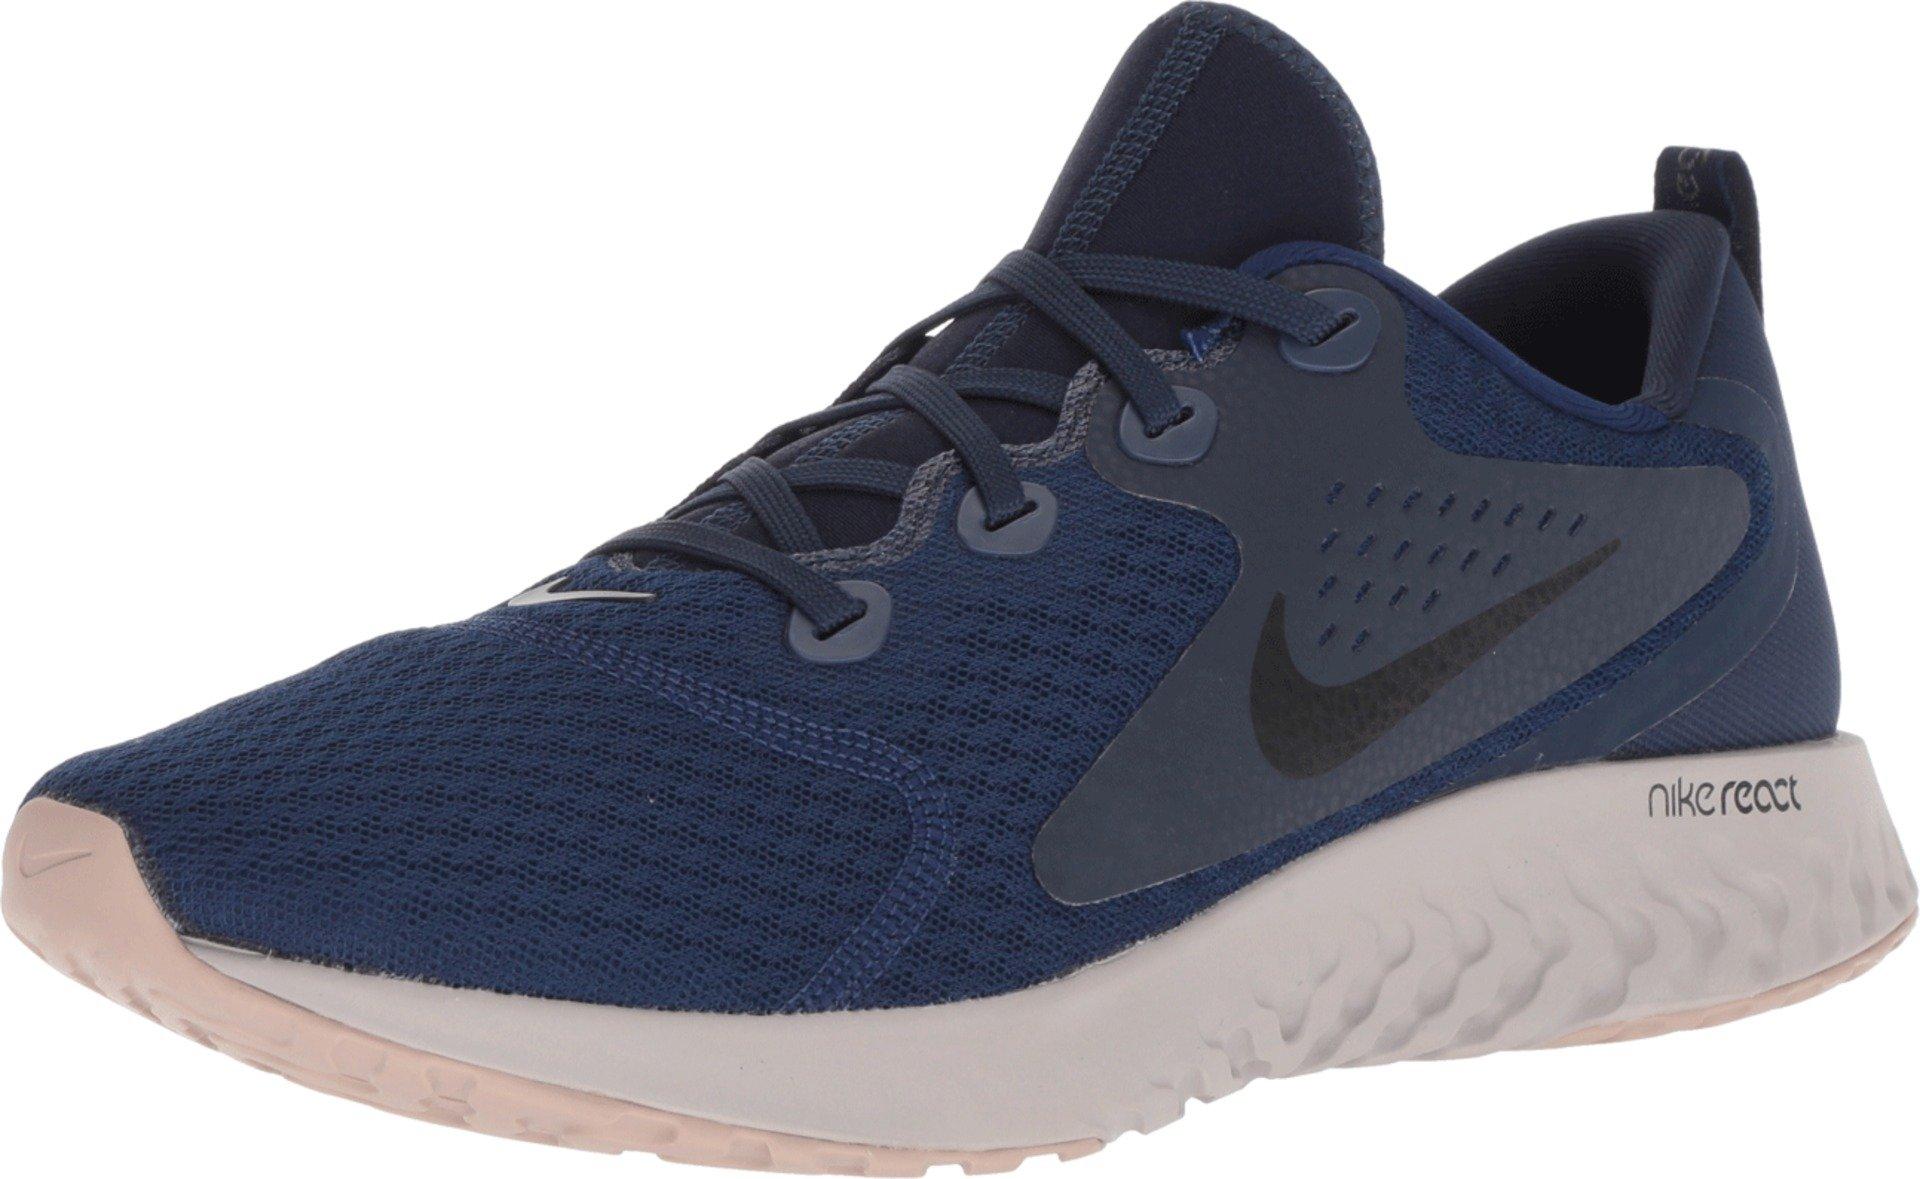 Nike Men's Legend React Running Shoe (10, Blue Void/Black) by Nike